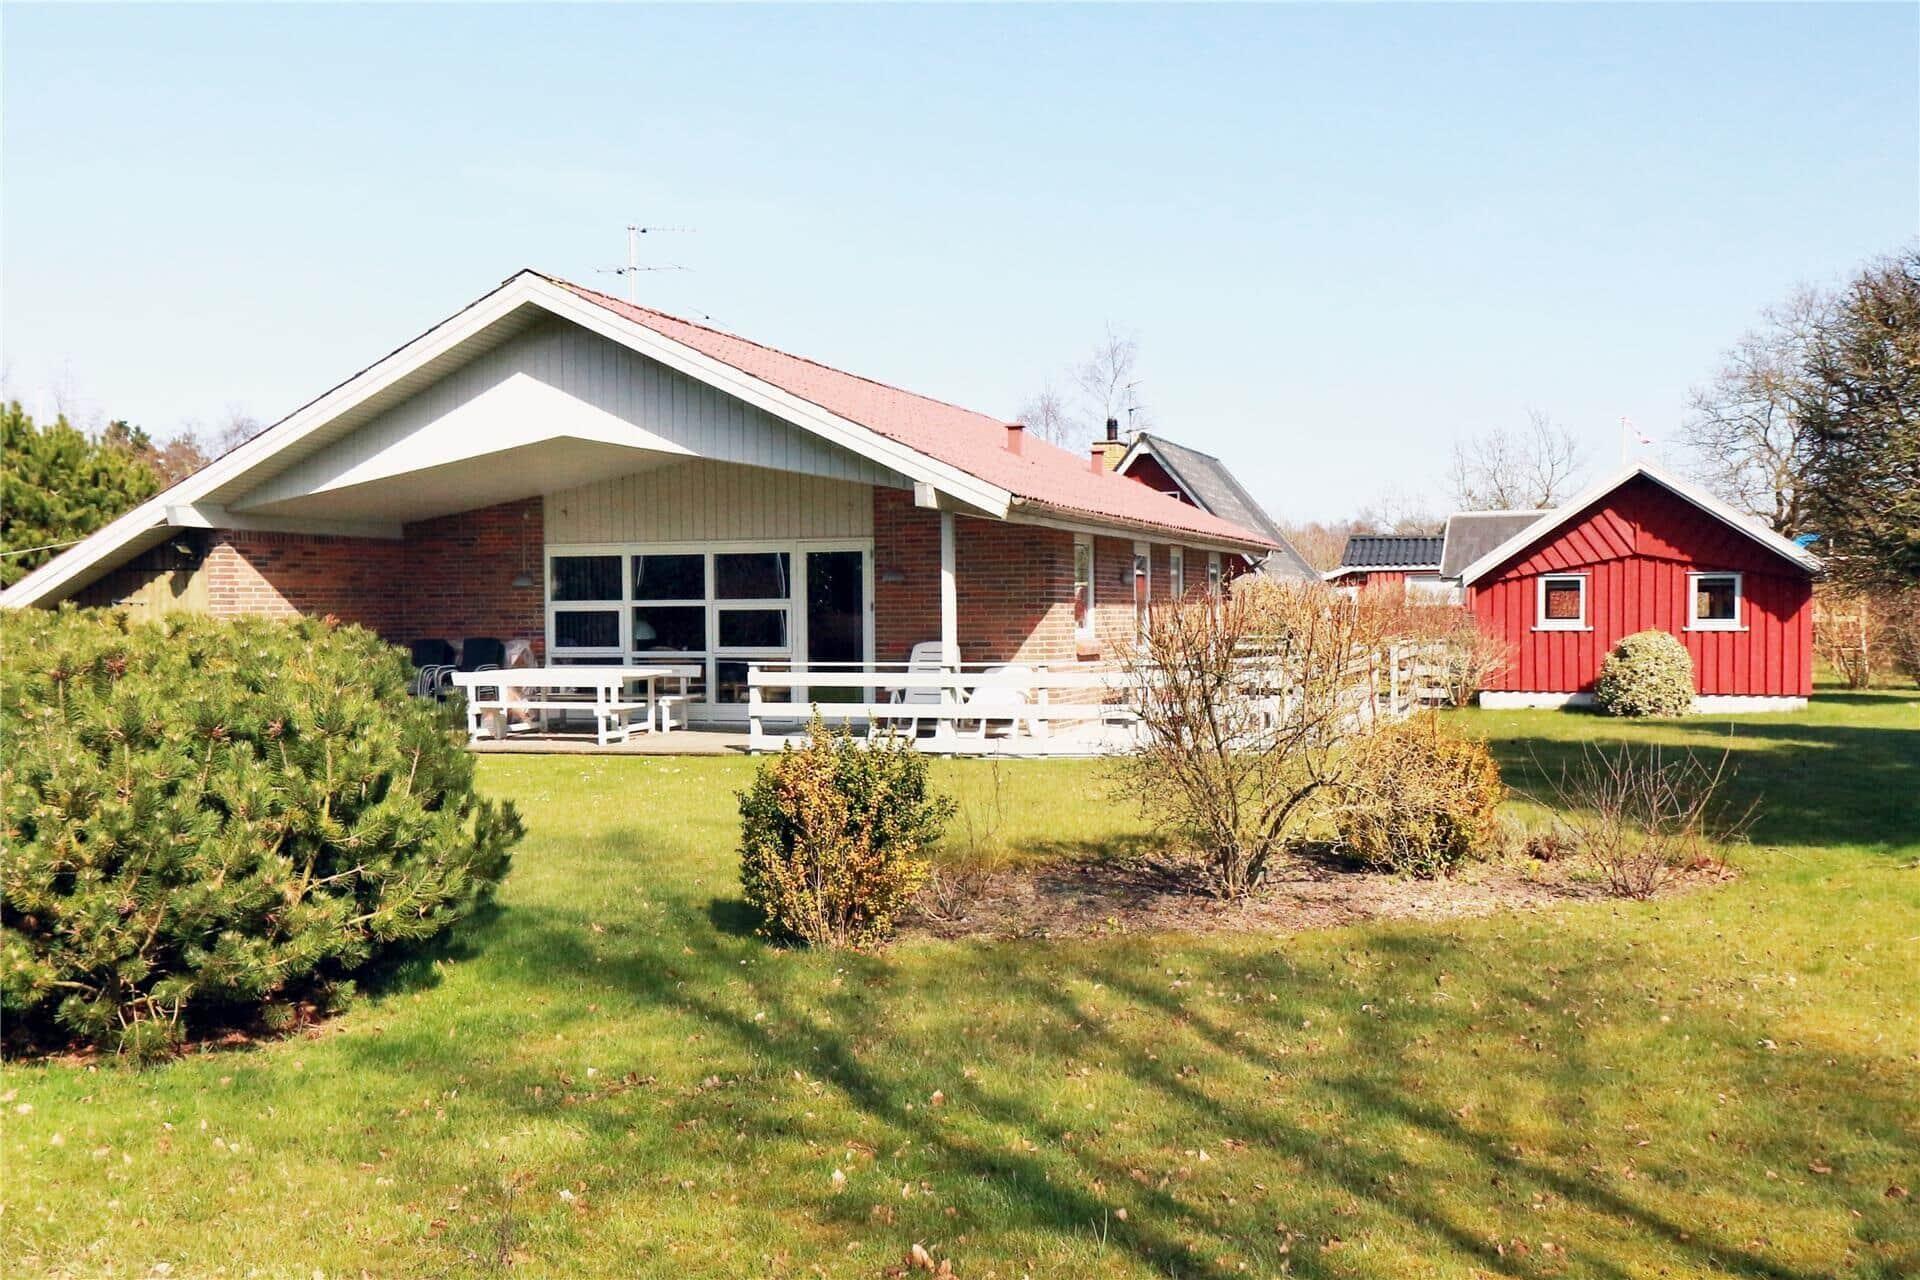 Billede 1-3 Sommerhus M64219, Prokyonvej 11, DK - 5500 Middelfart